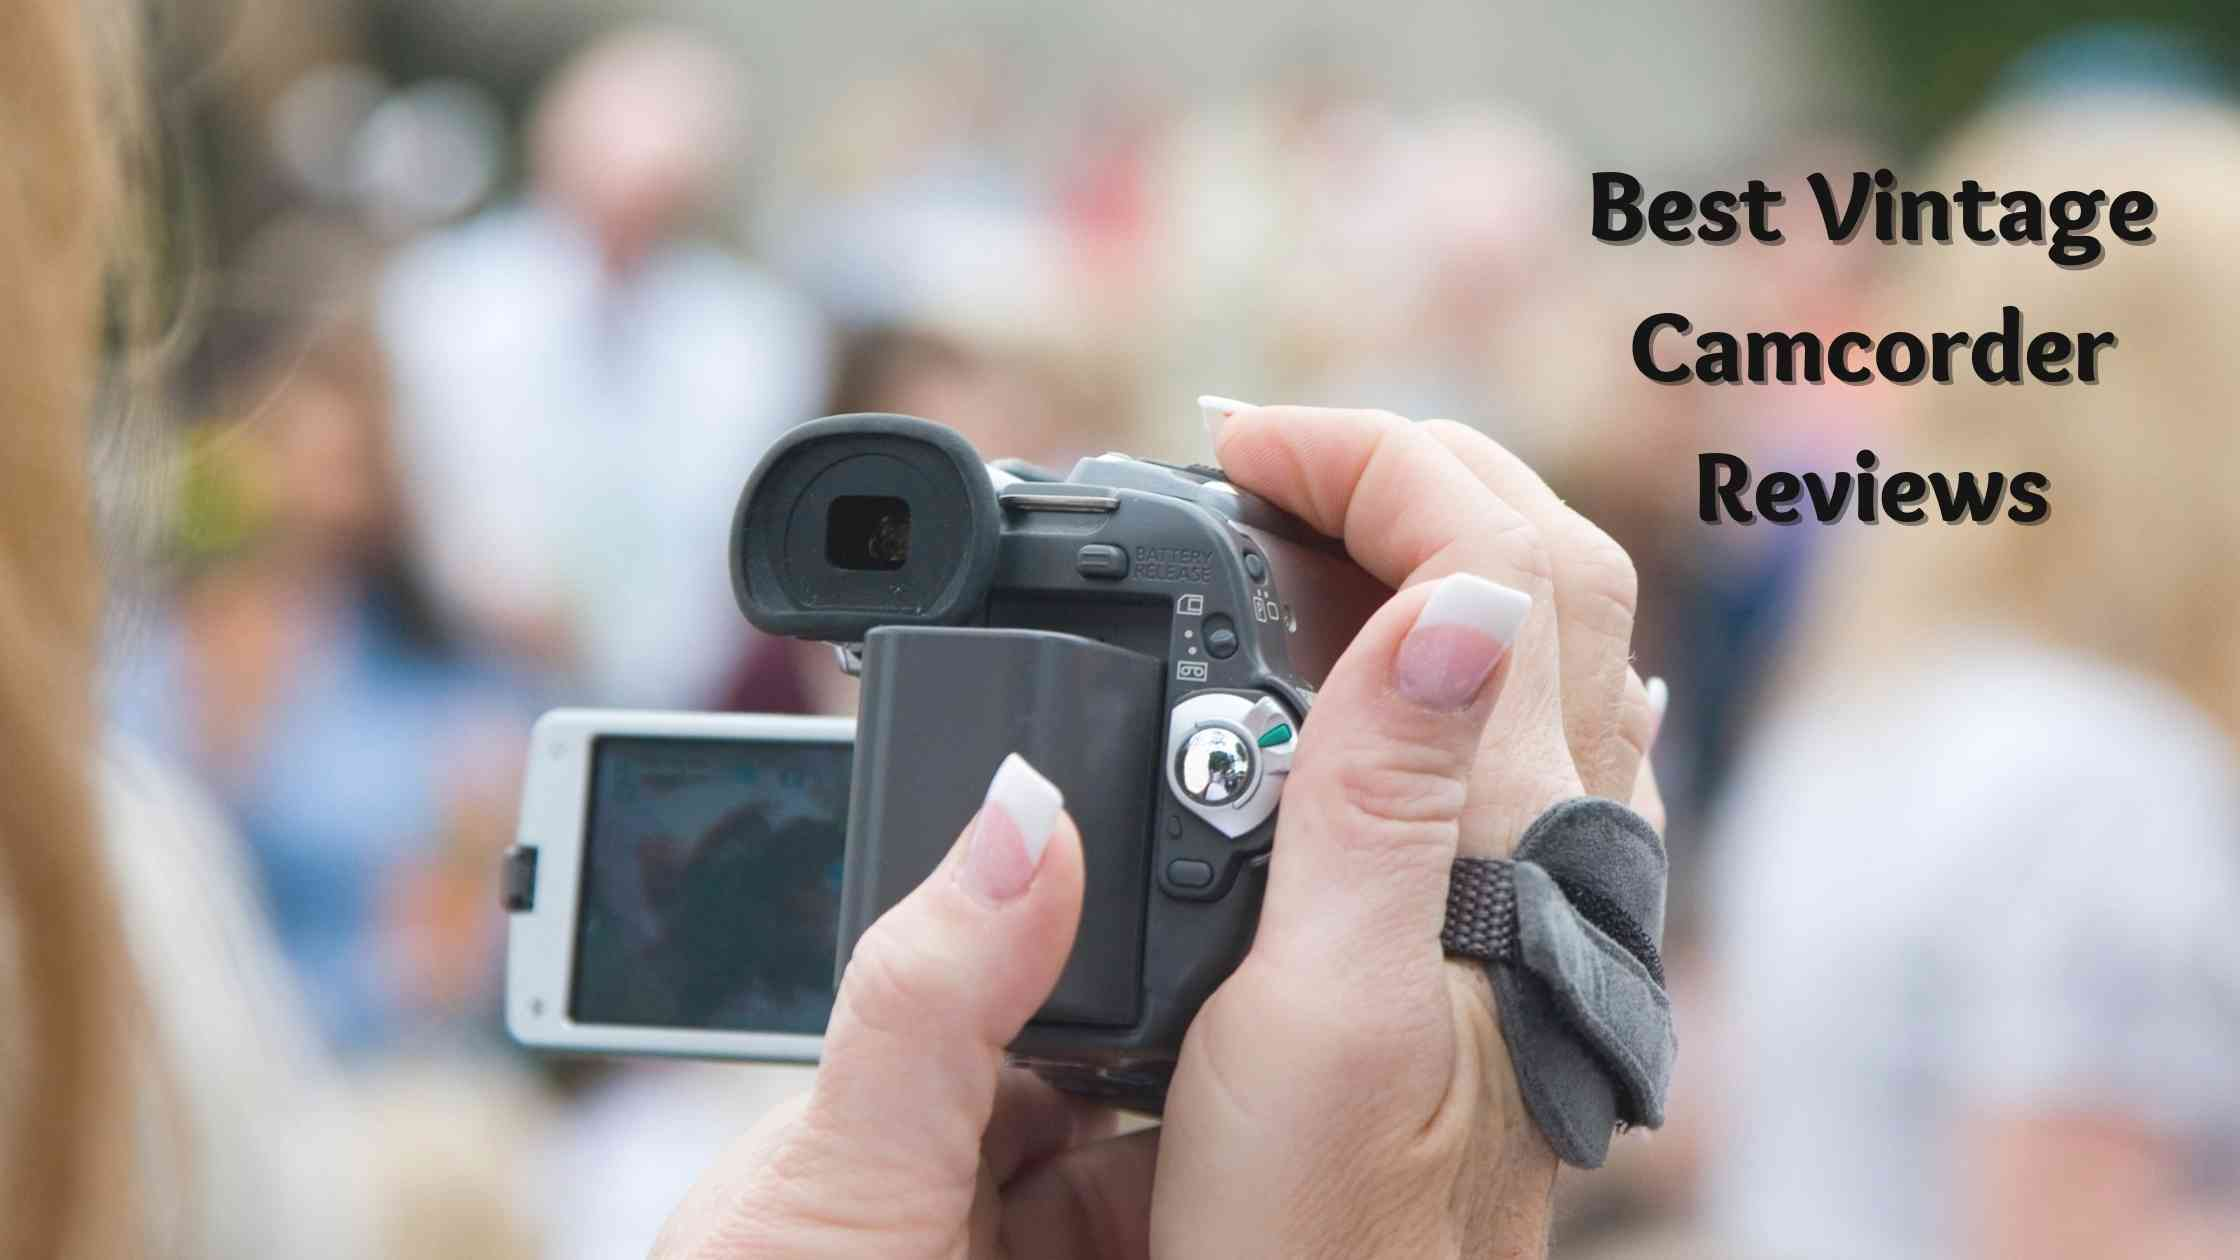 Best Vintage Camcorder Reviews